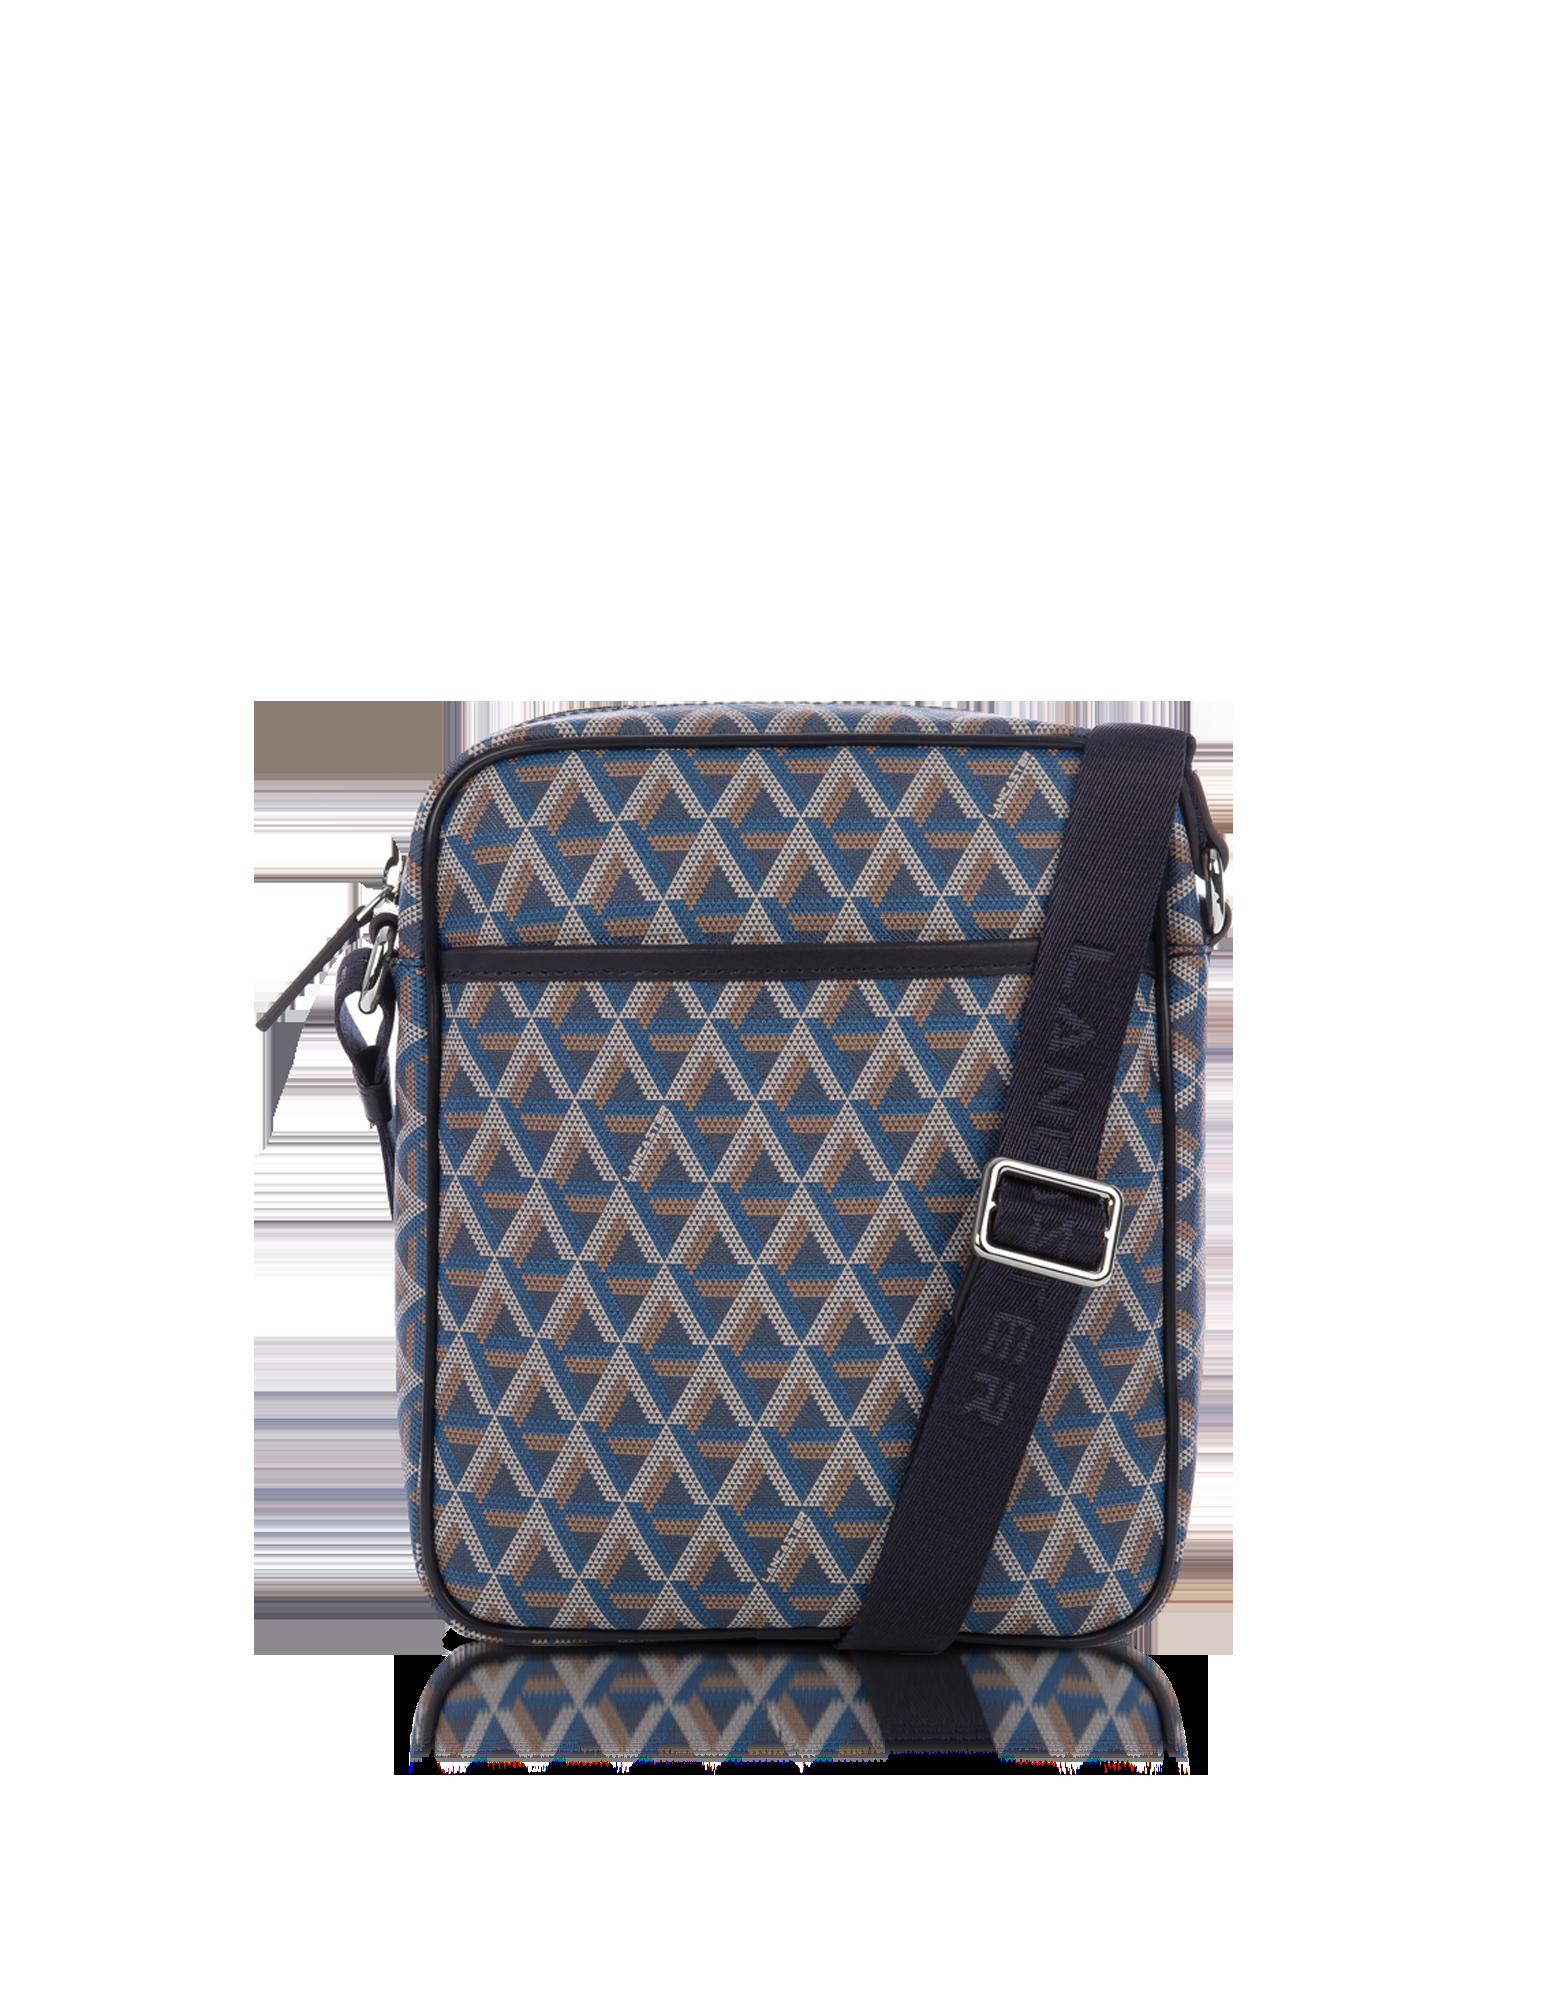 Image of Ikon Blue Coated Canvas Men's Crossbody Bag